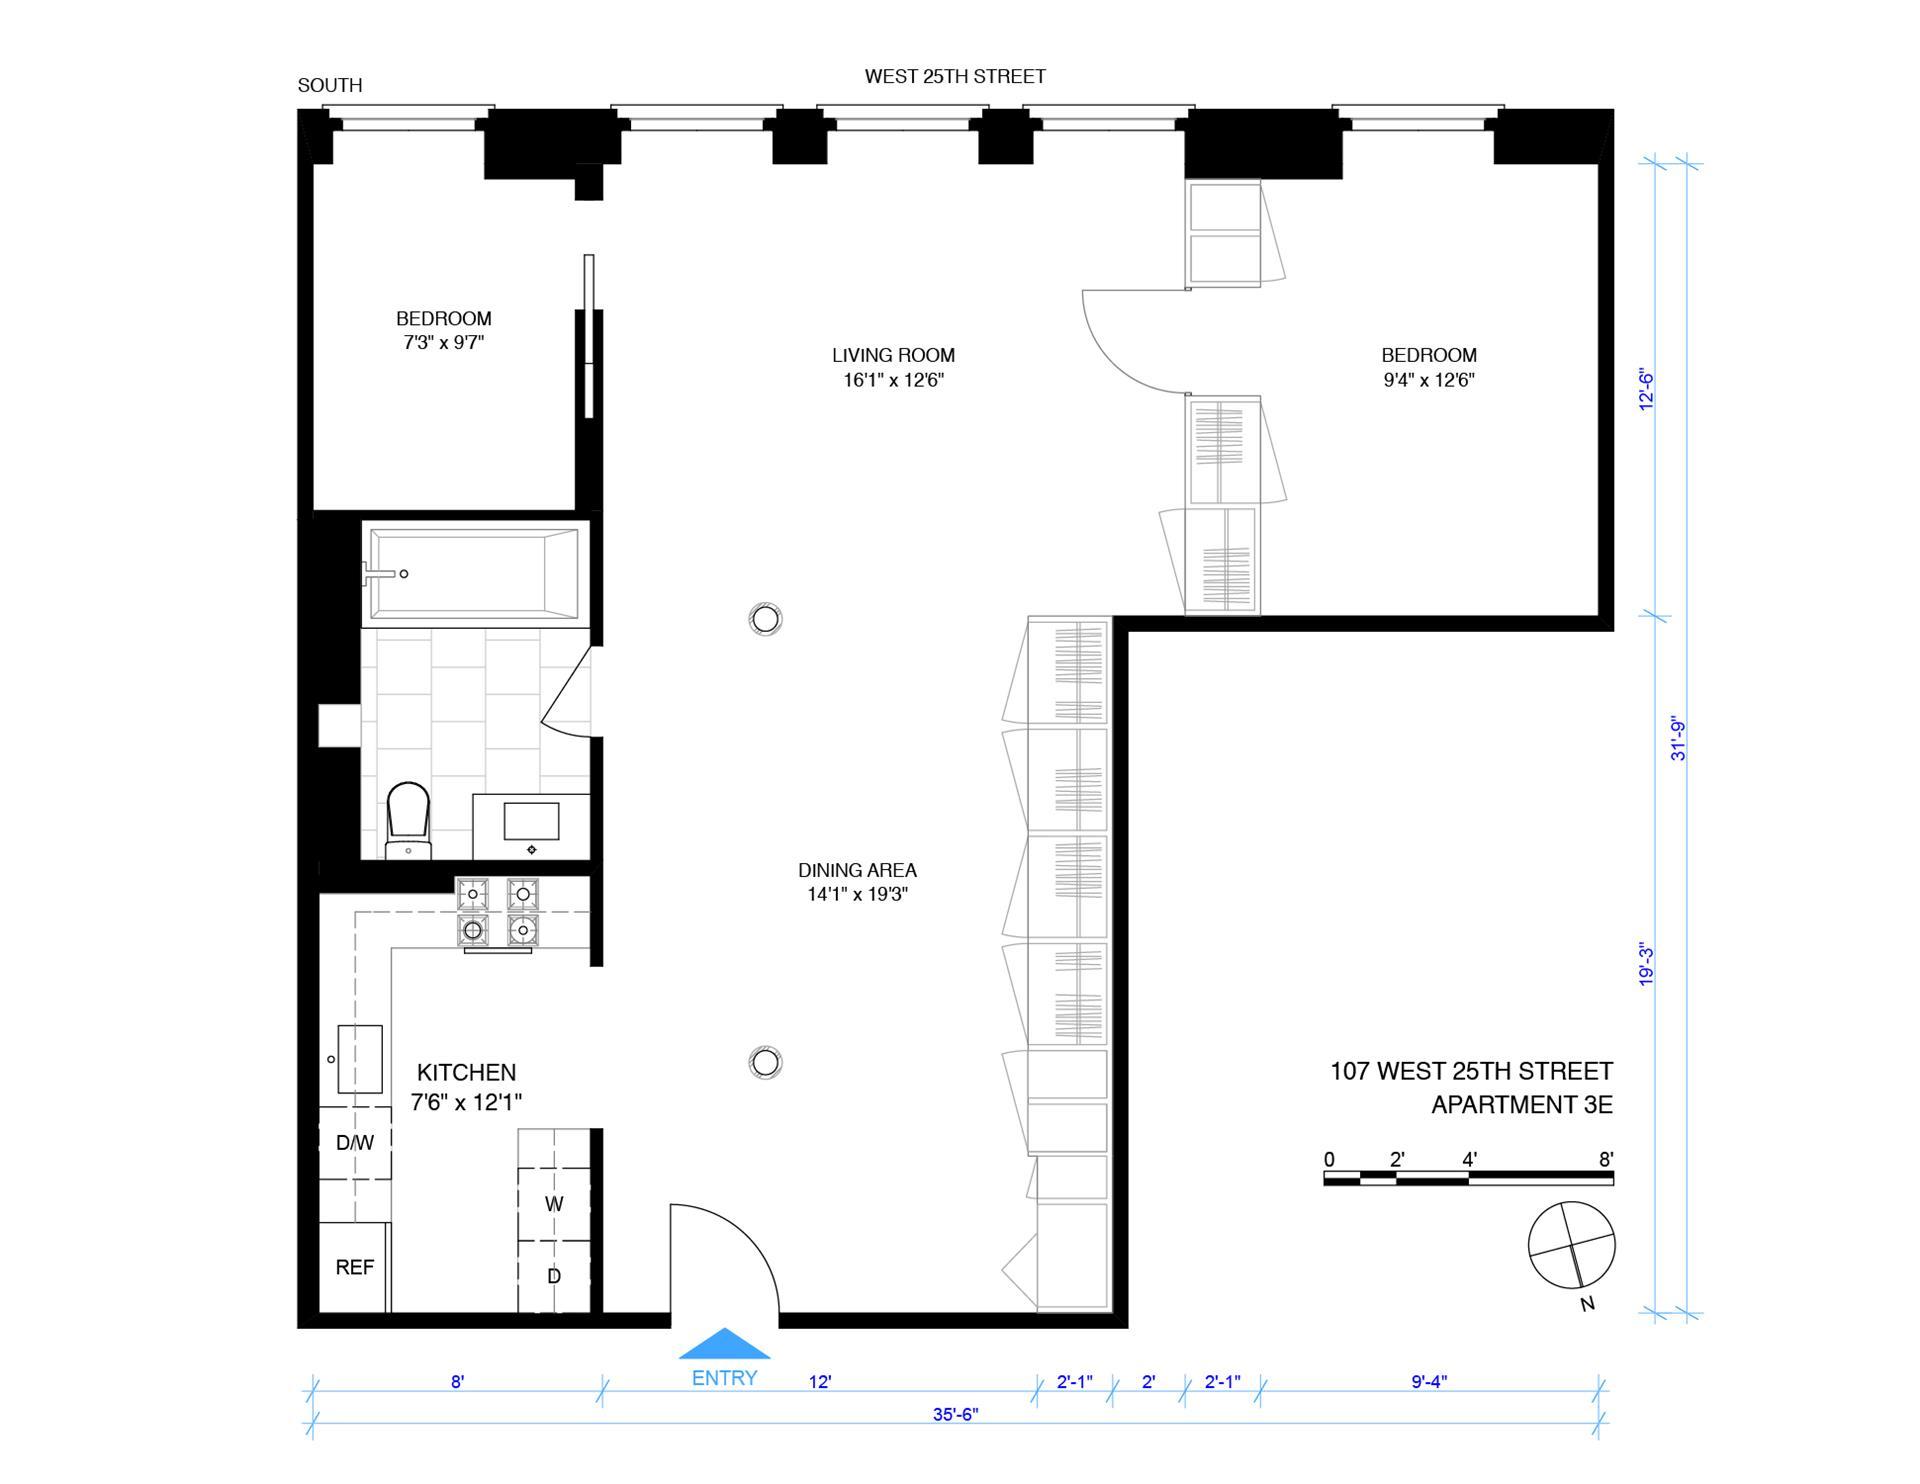 Floor plan of 107 West 25th St, 3E - Flatiron District, New York